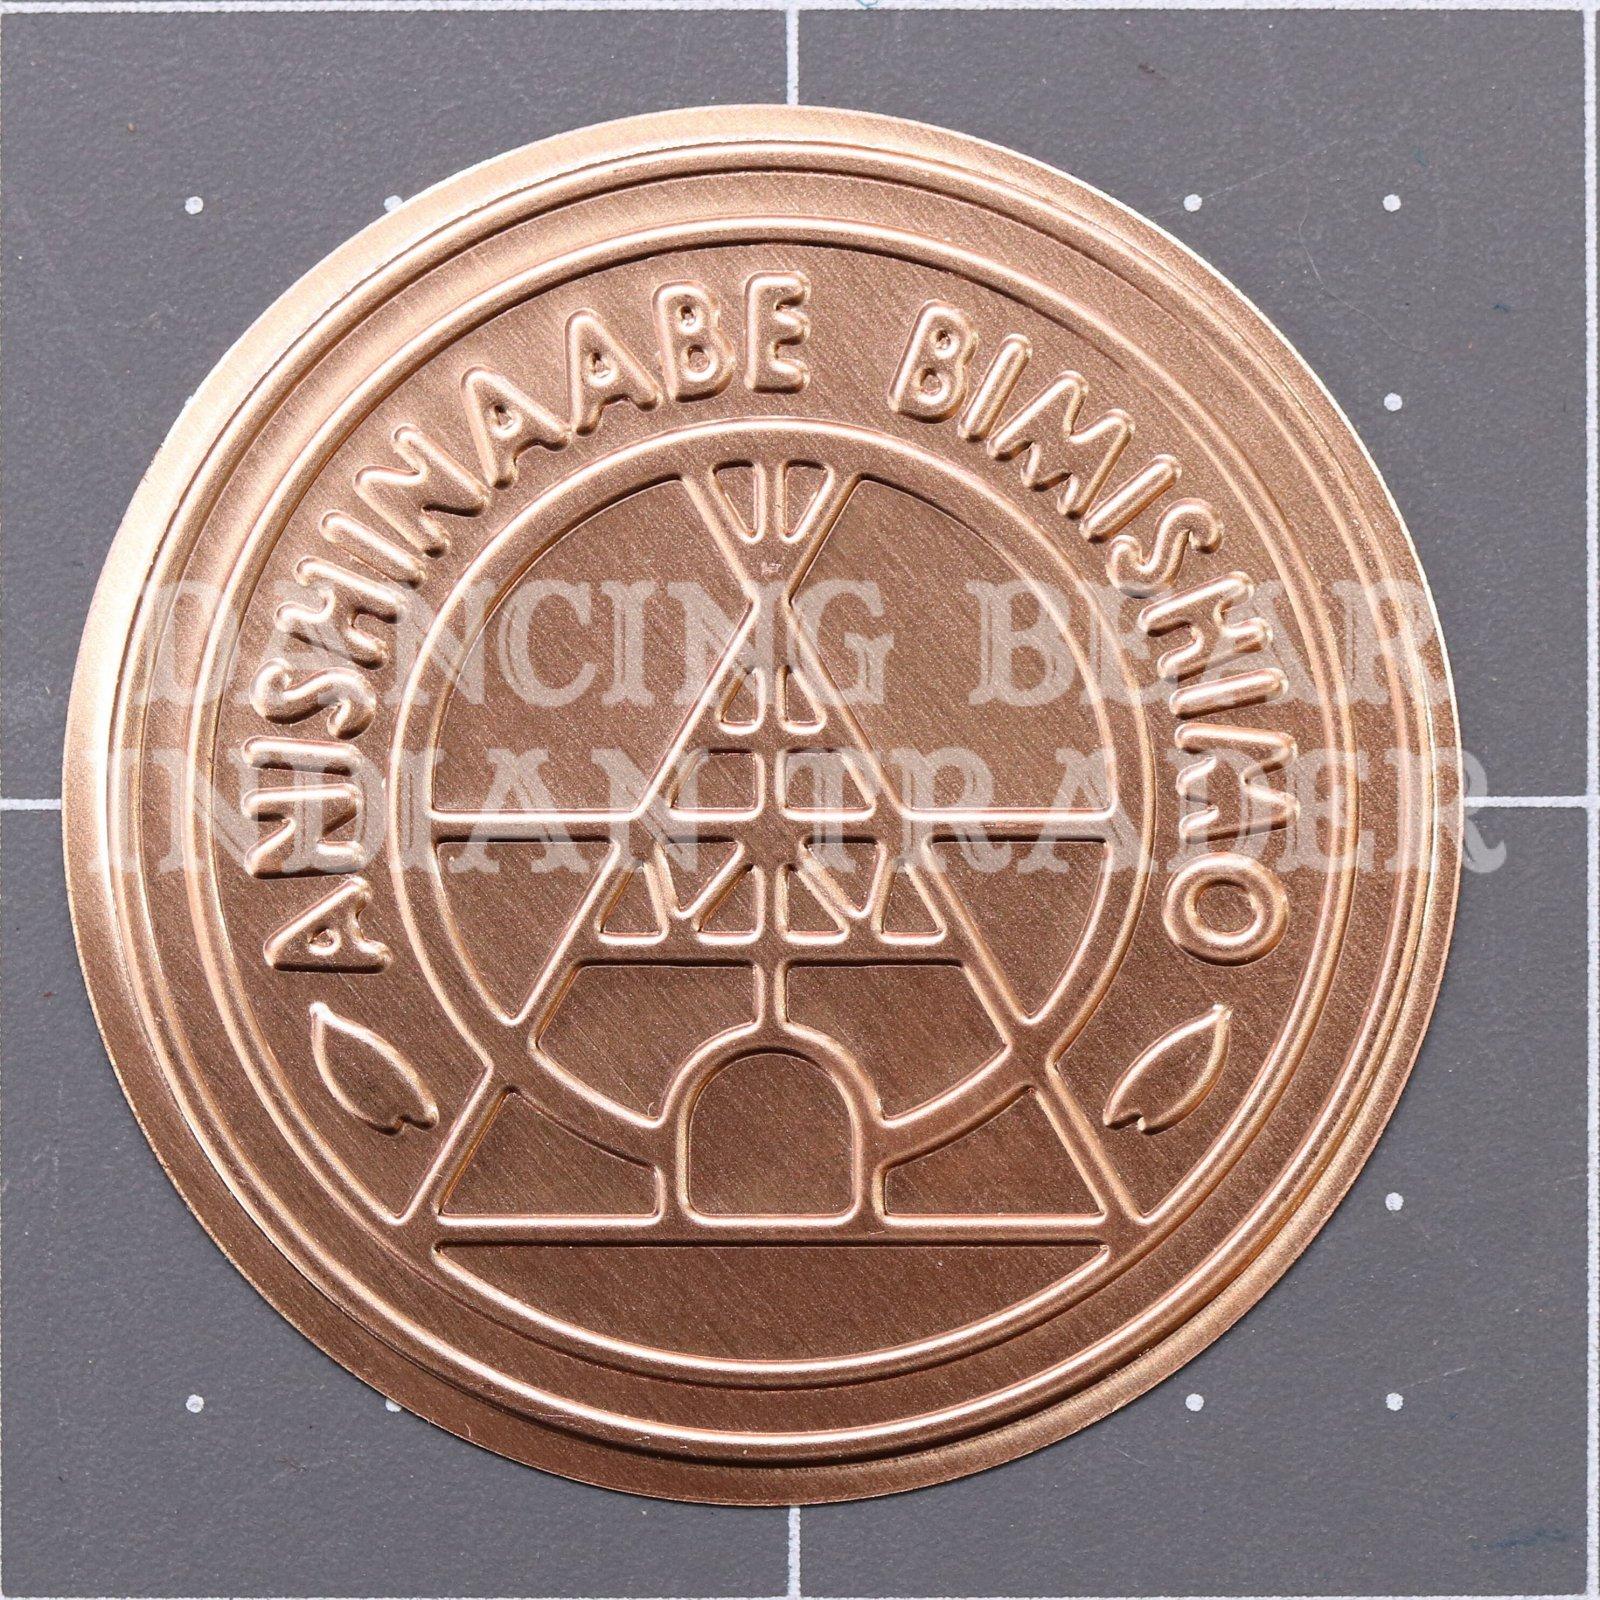 Anishinaabe Bimishimo Child Jingles 100 pc Copper